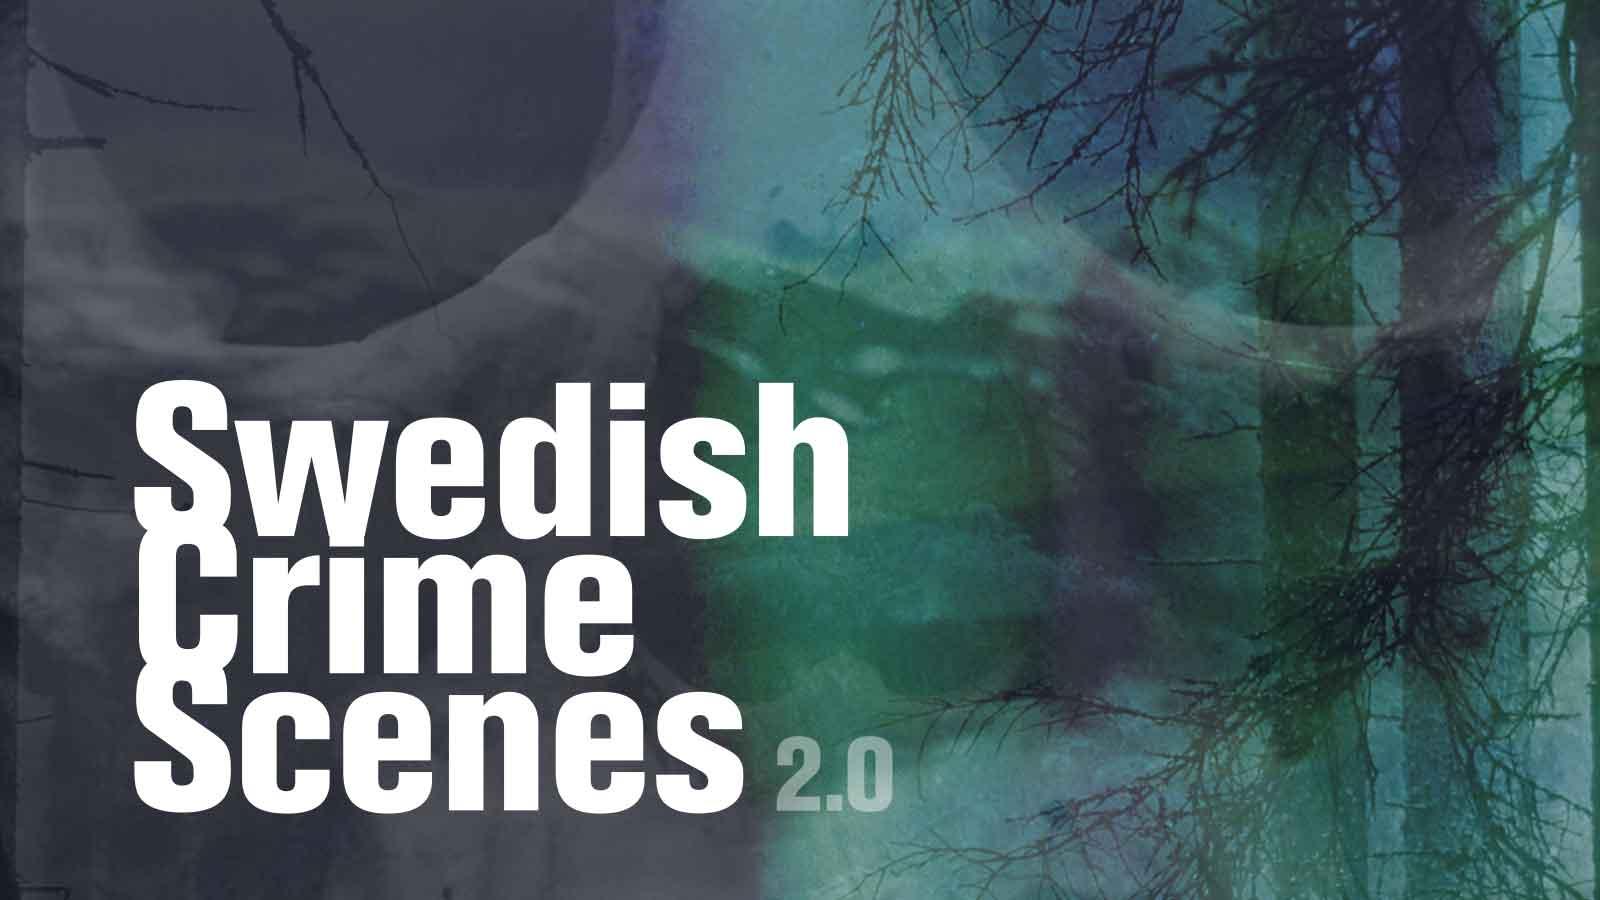 Swedish crime fiction